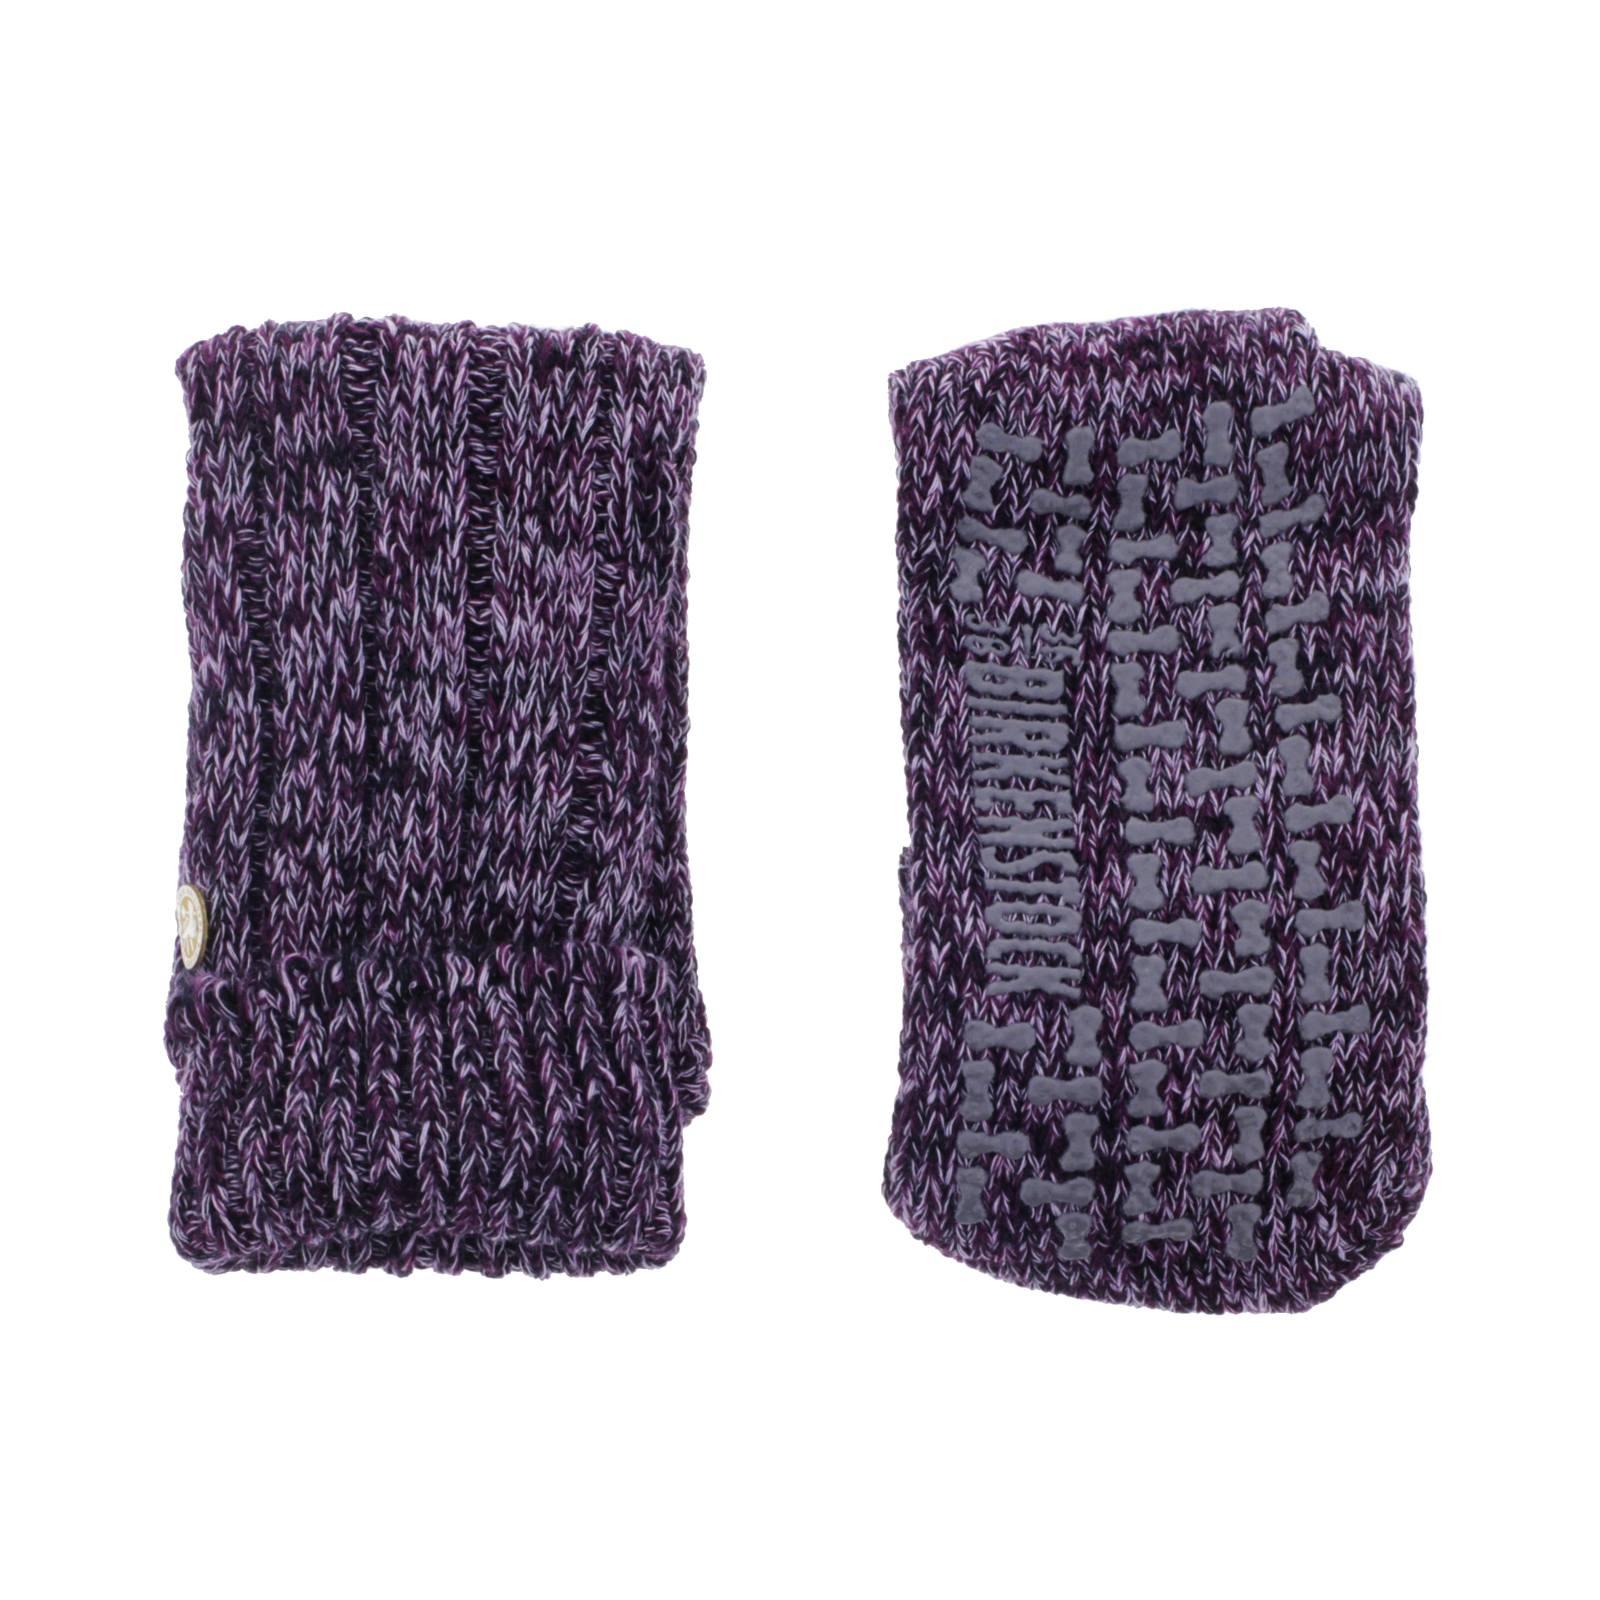 Birkenstock Damen Stopper Socken Twist HSH Lavender Fog